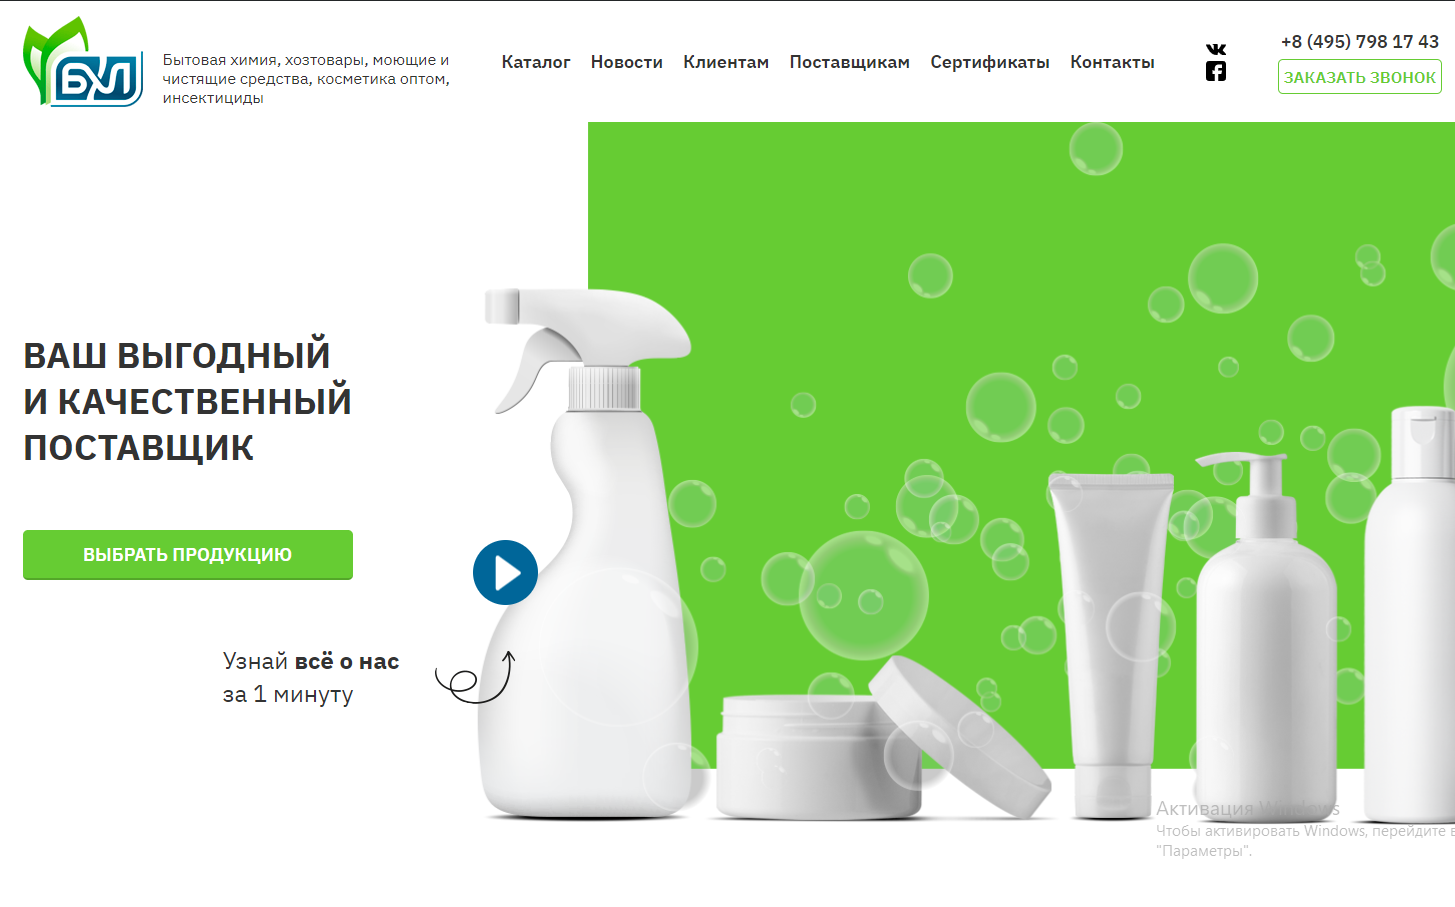 (c) Hoztovari.ru